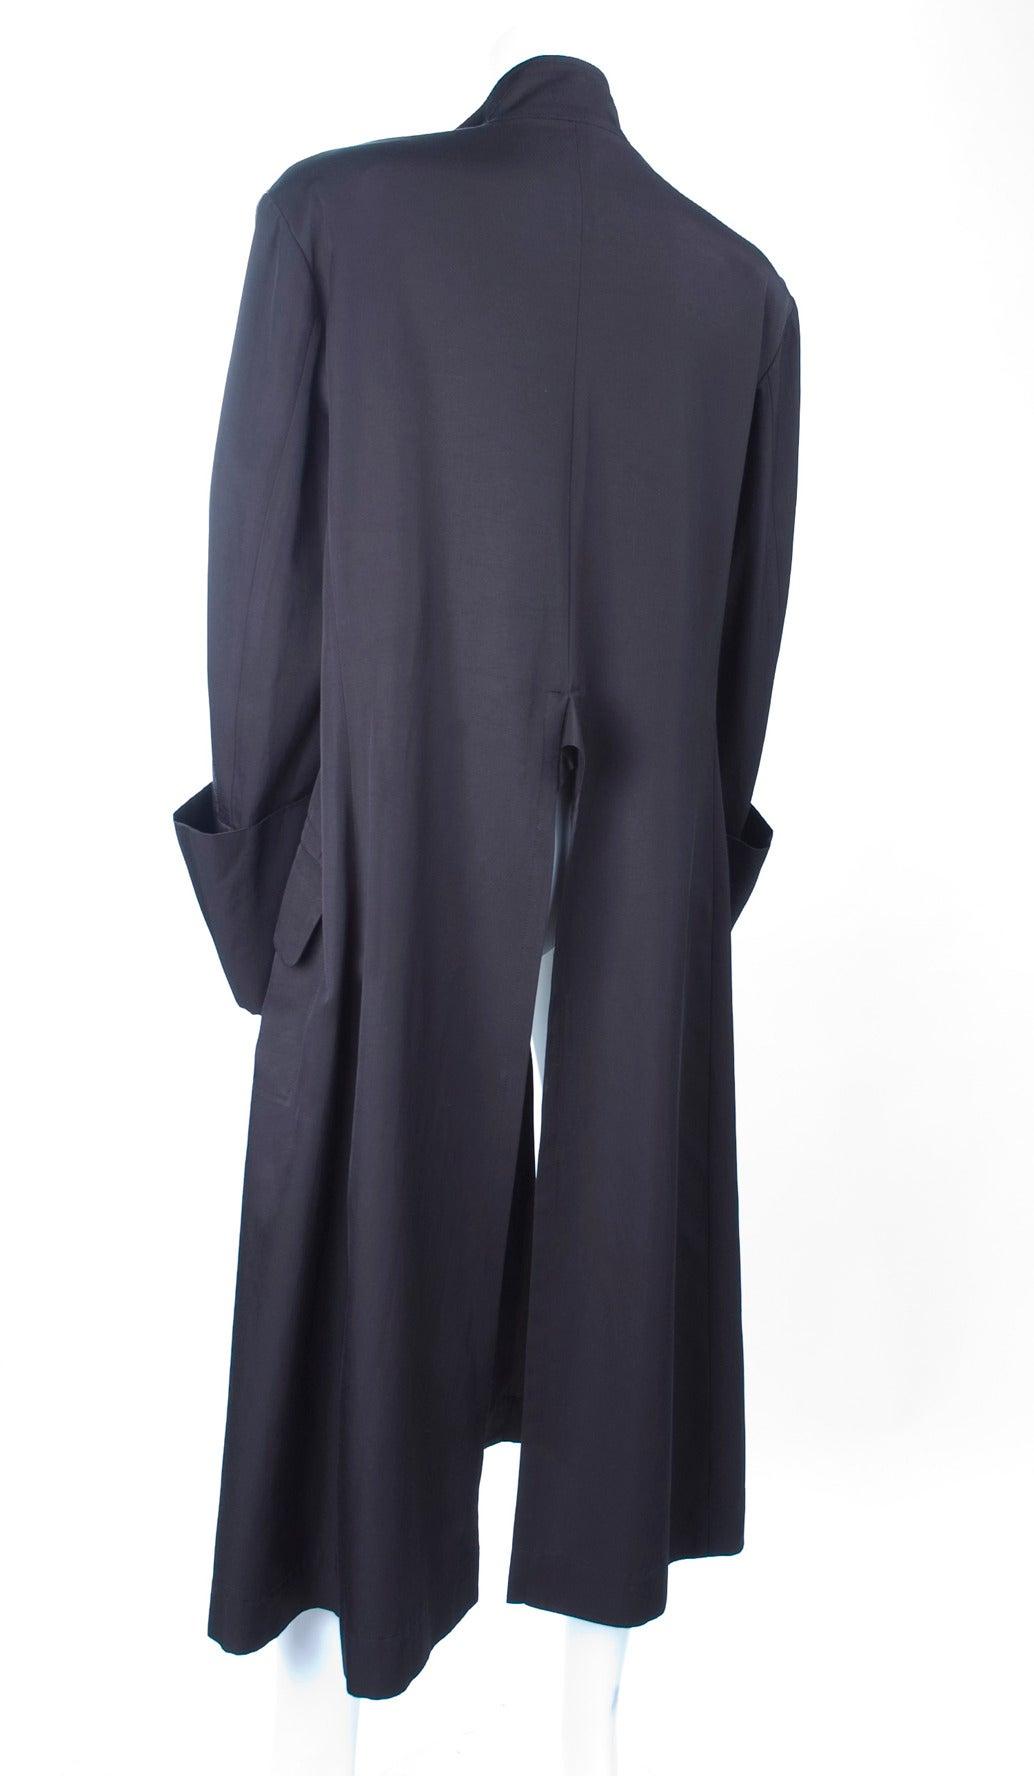 brave yohji yamamoto outerwear 9